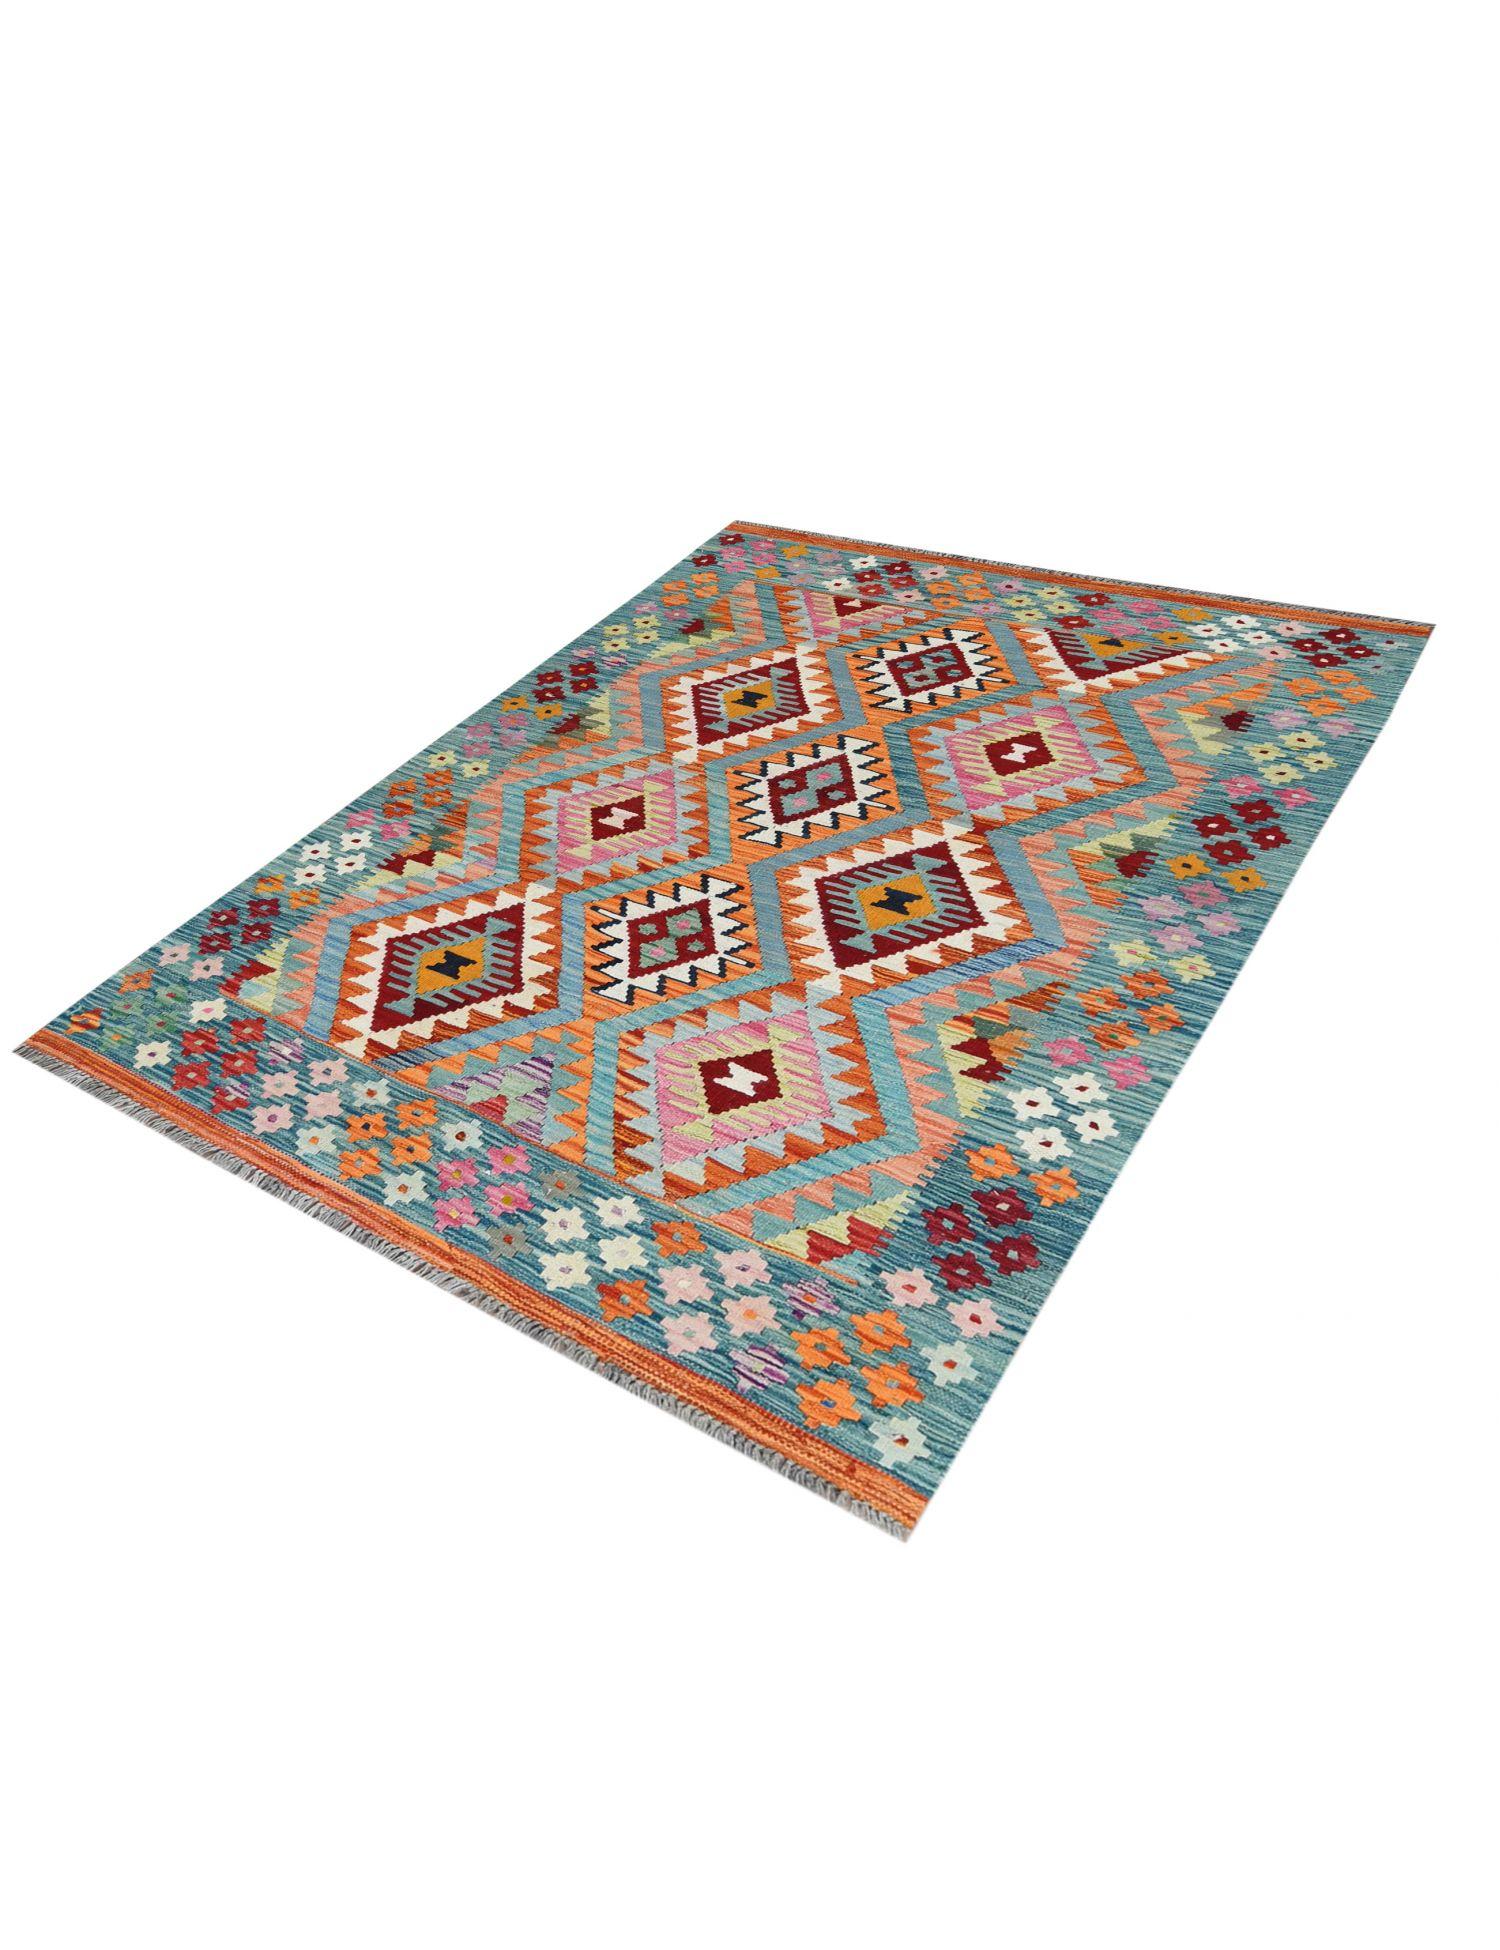 KELIM  mehrfarbig <br/>181 x 120 cm